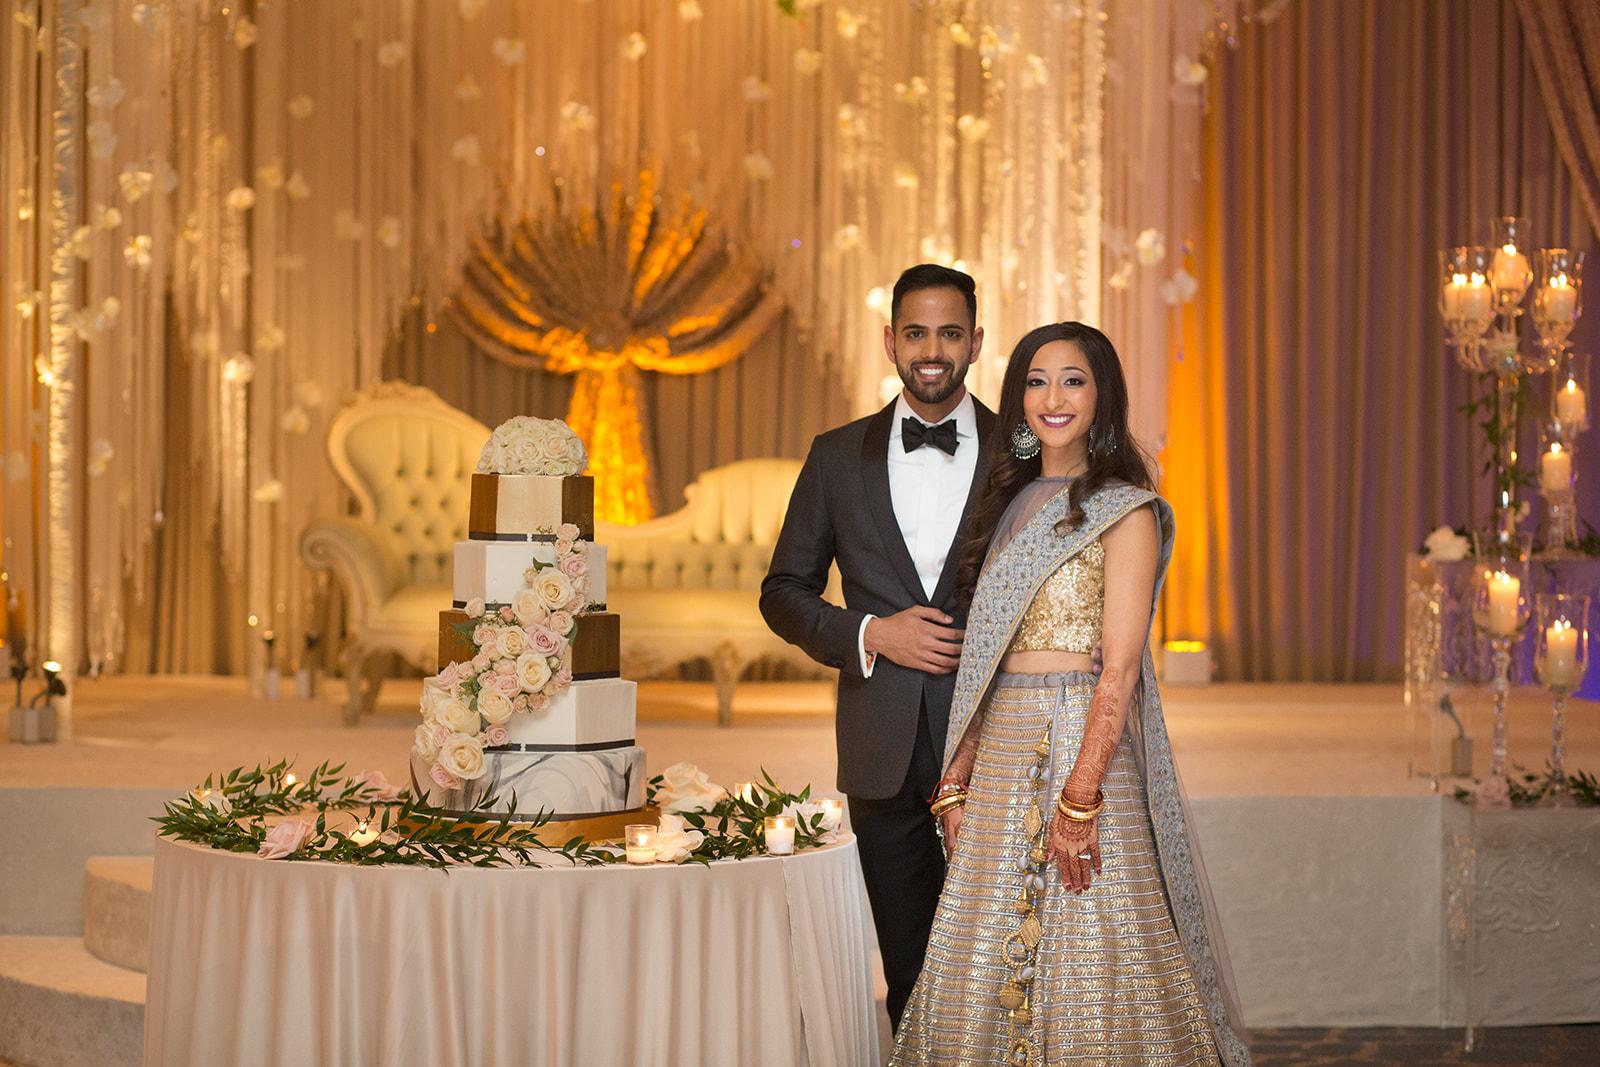 Le Cape Weddings - Puja and Kheelan - Wedding Reception -60.jpg